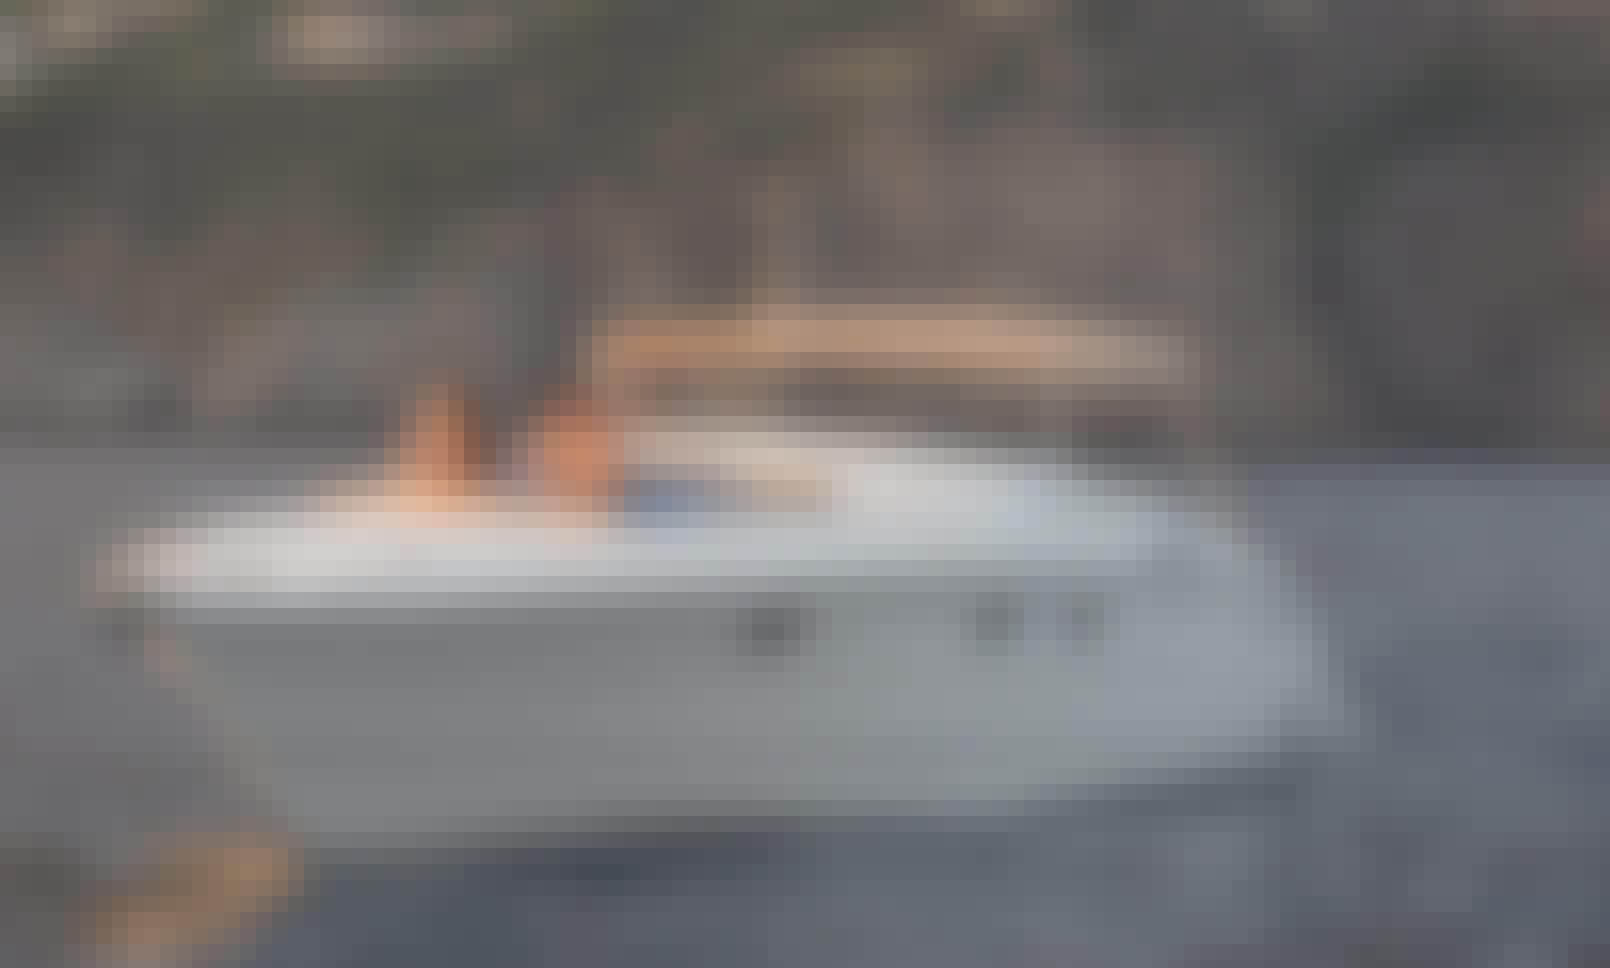 Amalfi Coast Luxury Yacht Tour on Tornado Eleven 38 Motor Yacht